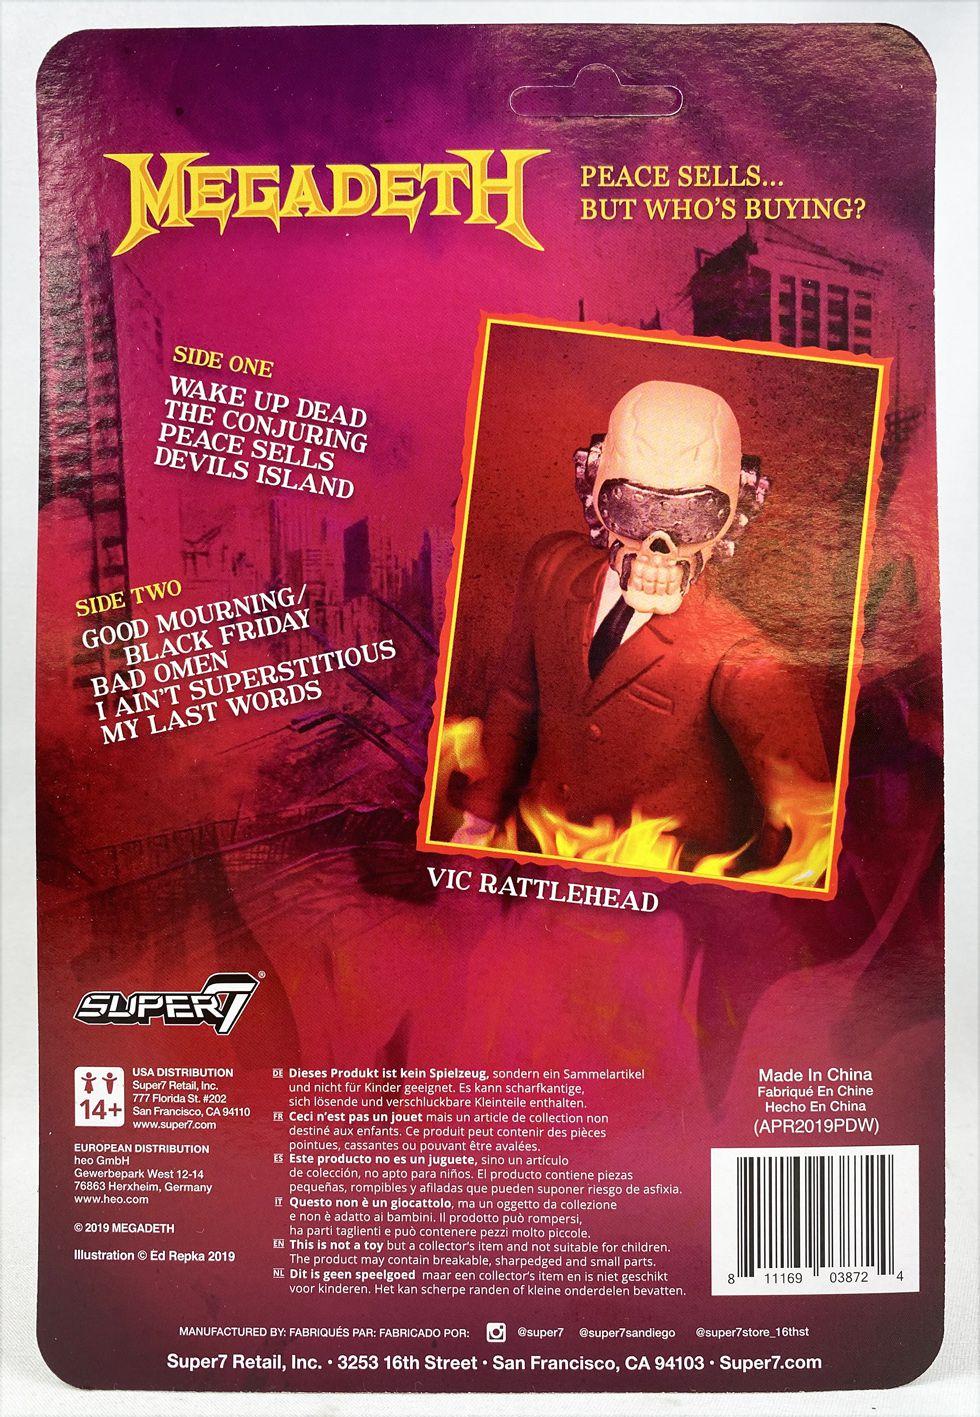 Megadeath- Figurine ReAction Super7 - Vic Rattlehead